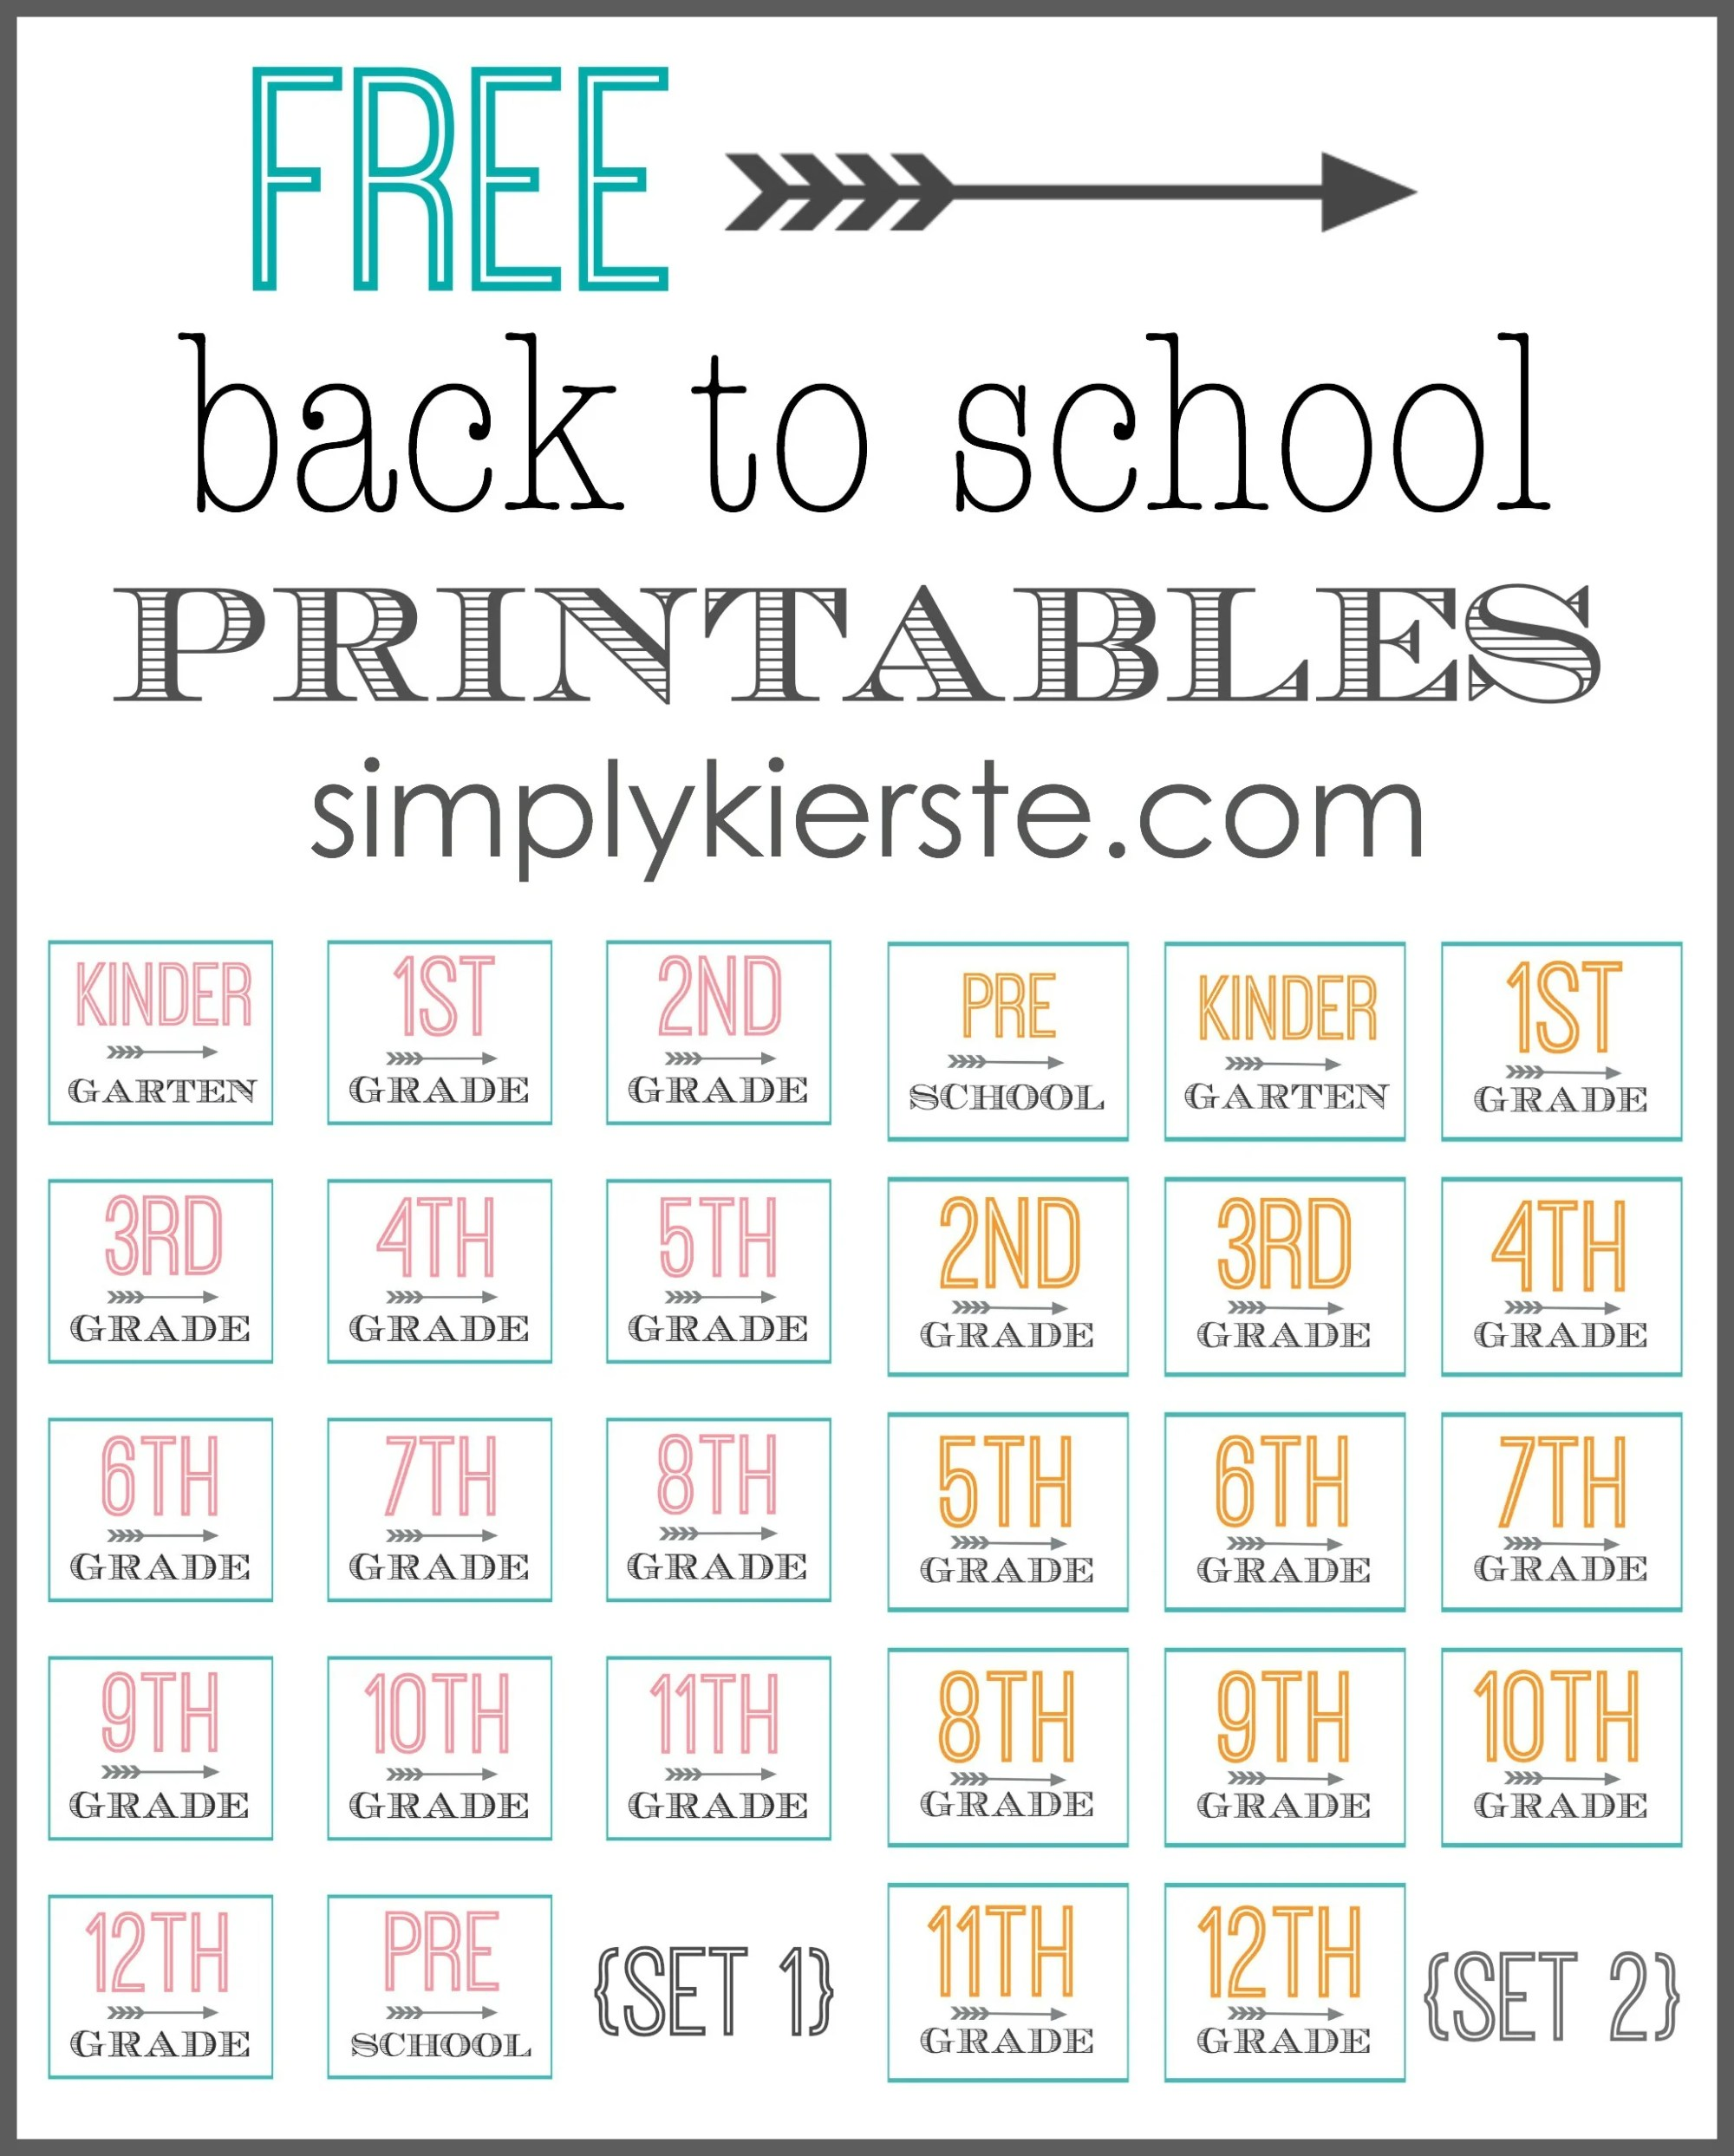 hight resolution of Free Back to School Printables   oldsaltfarm.com